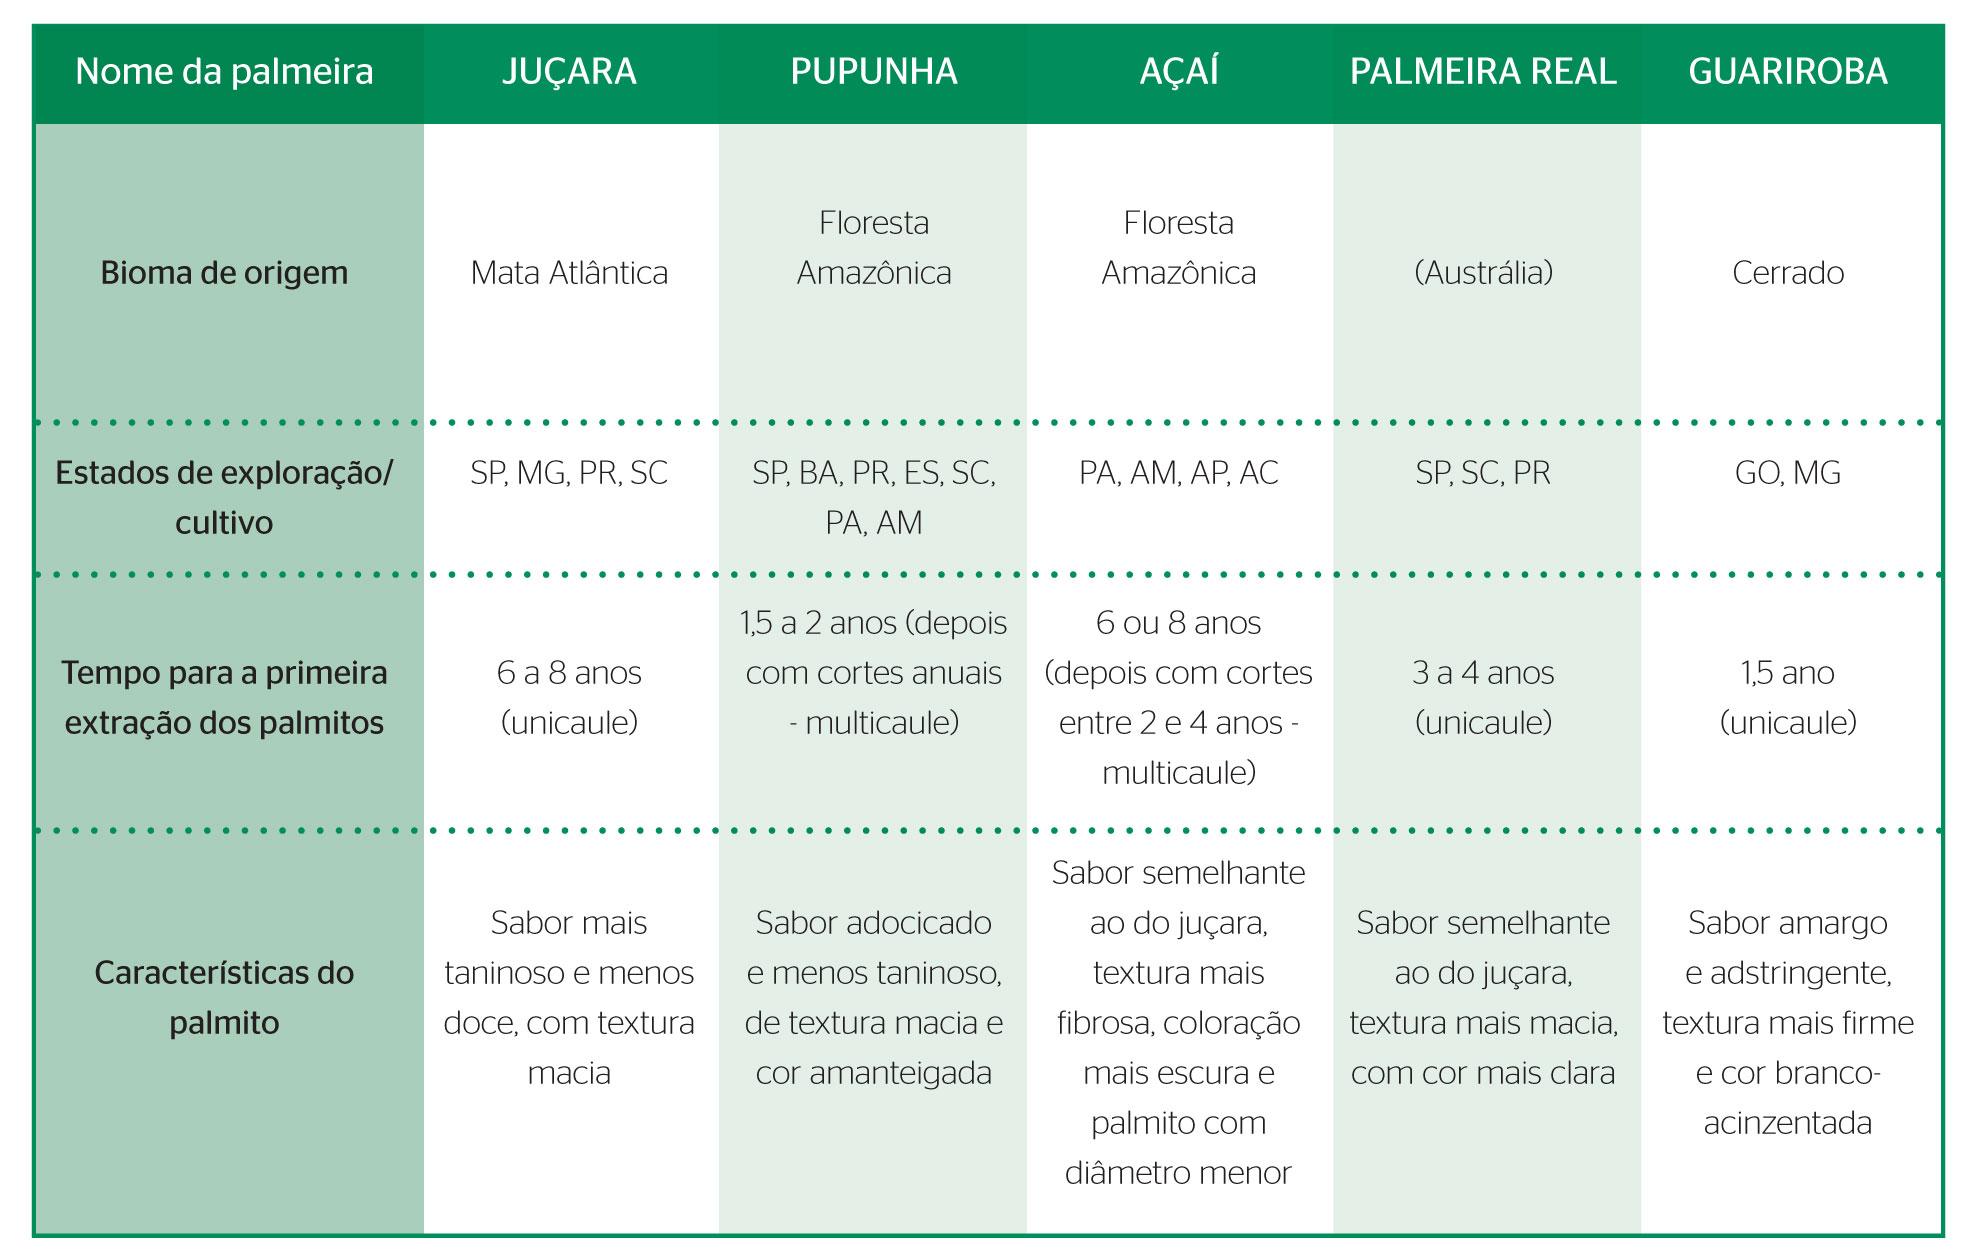 MENU 201 - SACOLA BRASILEIRA